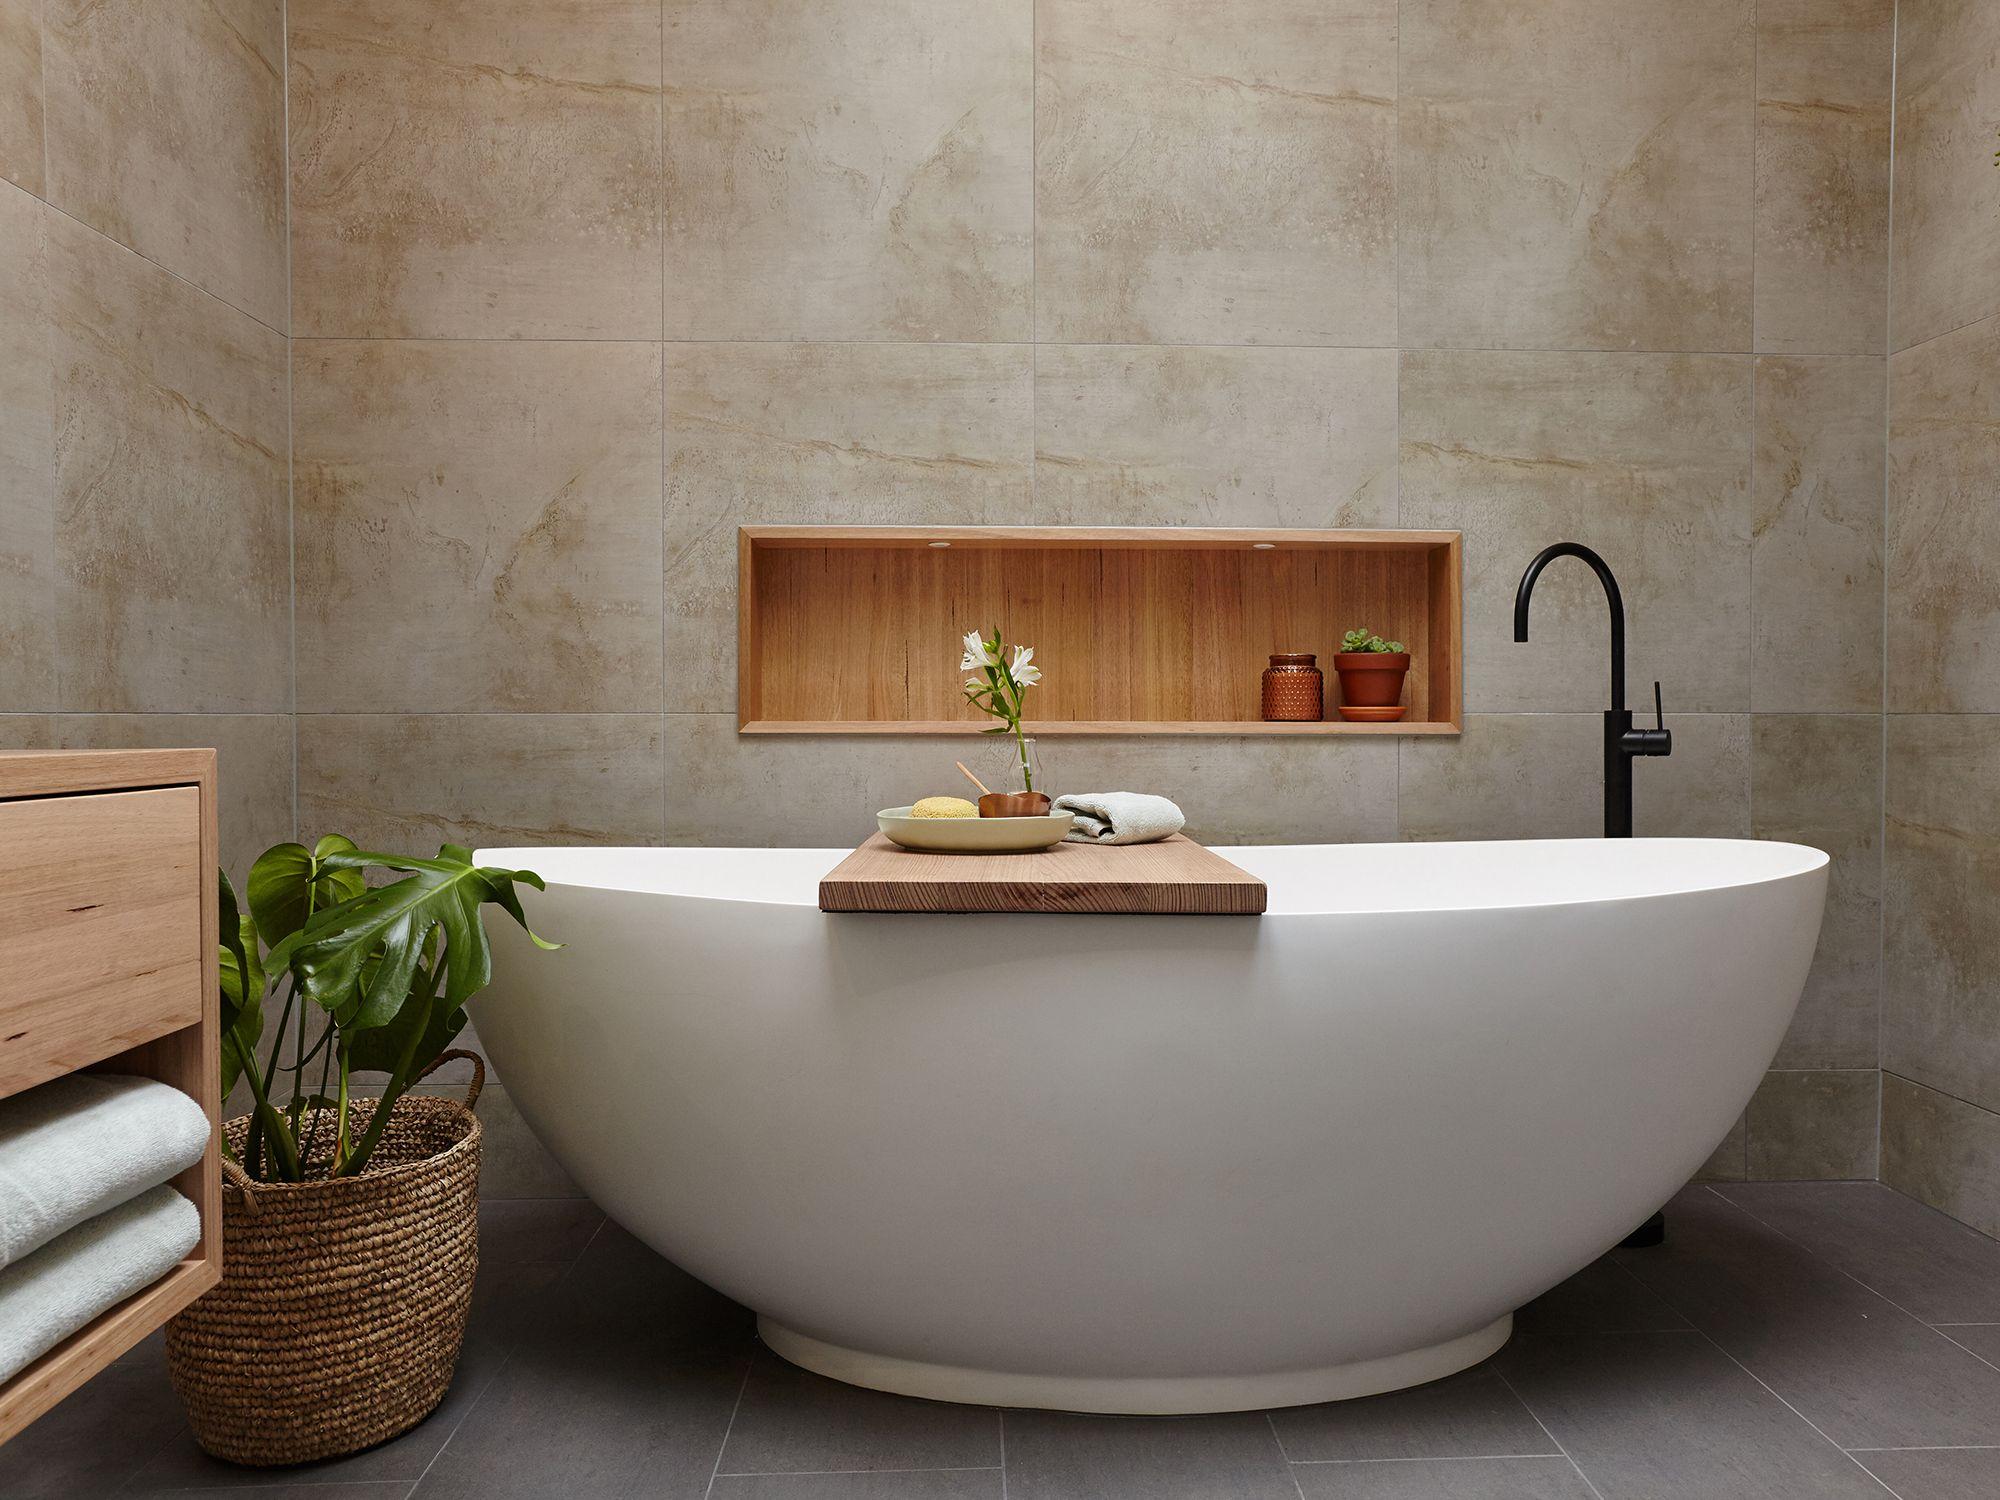 Bathroom Sinks Bunnings bunnings bathtub | bathroom | pinterest | things to buy, lifestyle